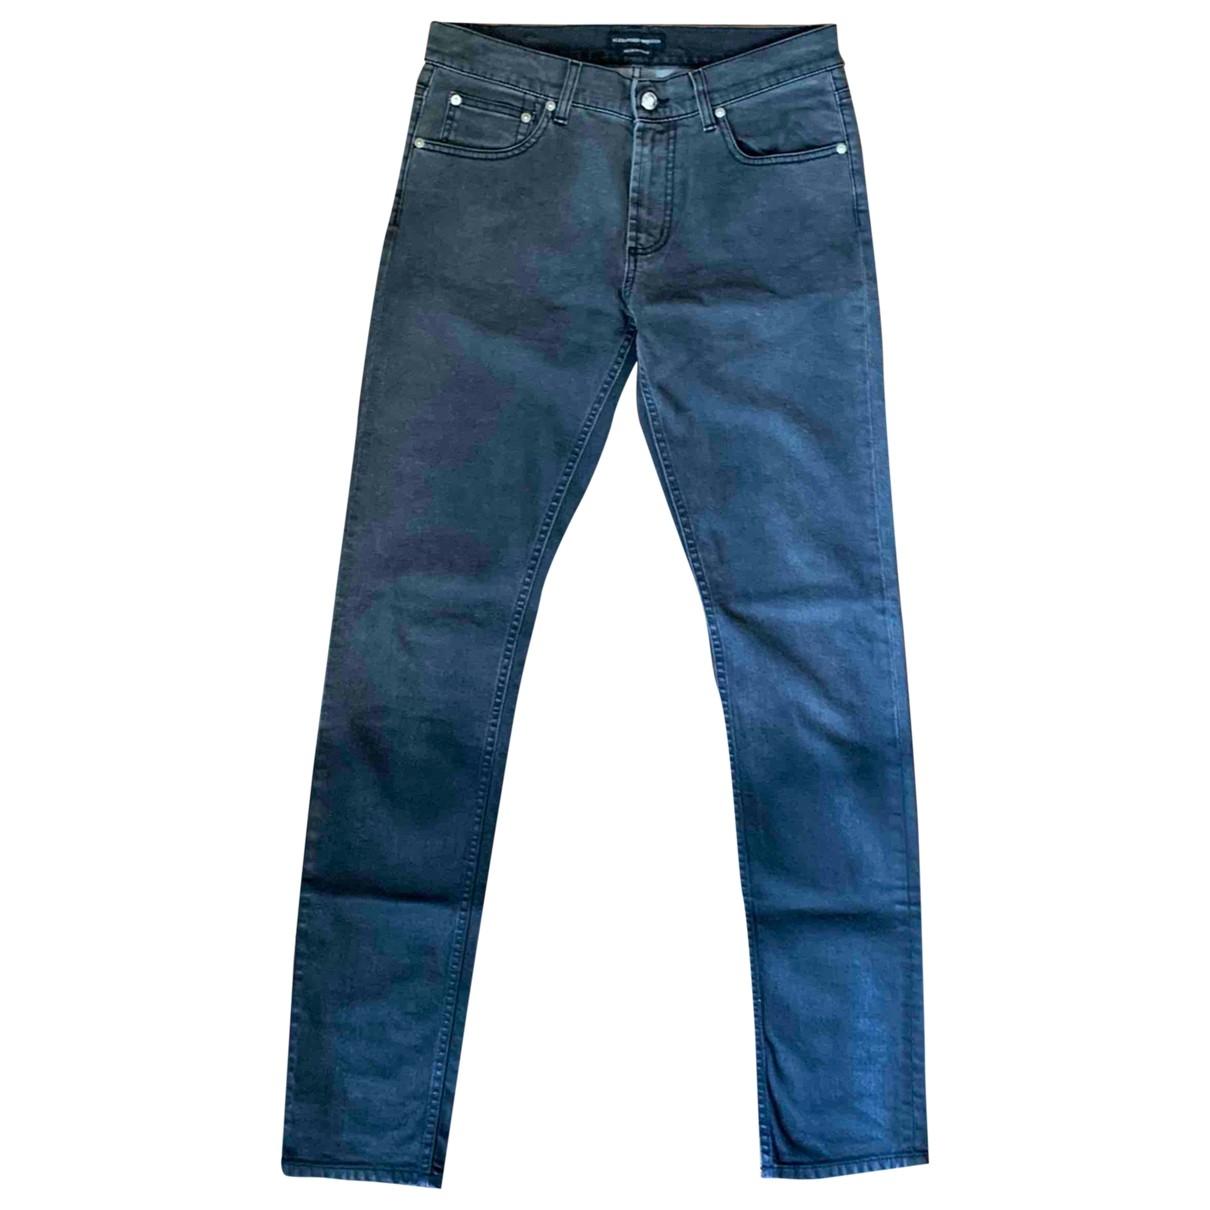 Alexander Mcqueen \N Grey Cotton - elasthane Jeans for Men 40 - 42 FR